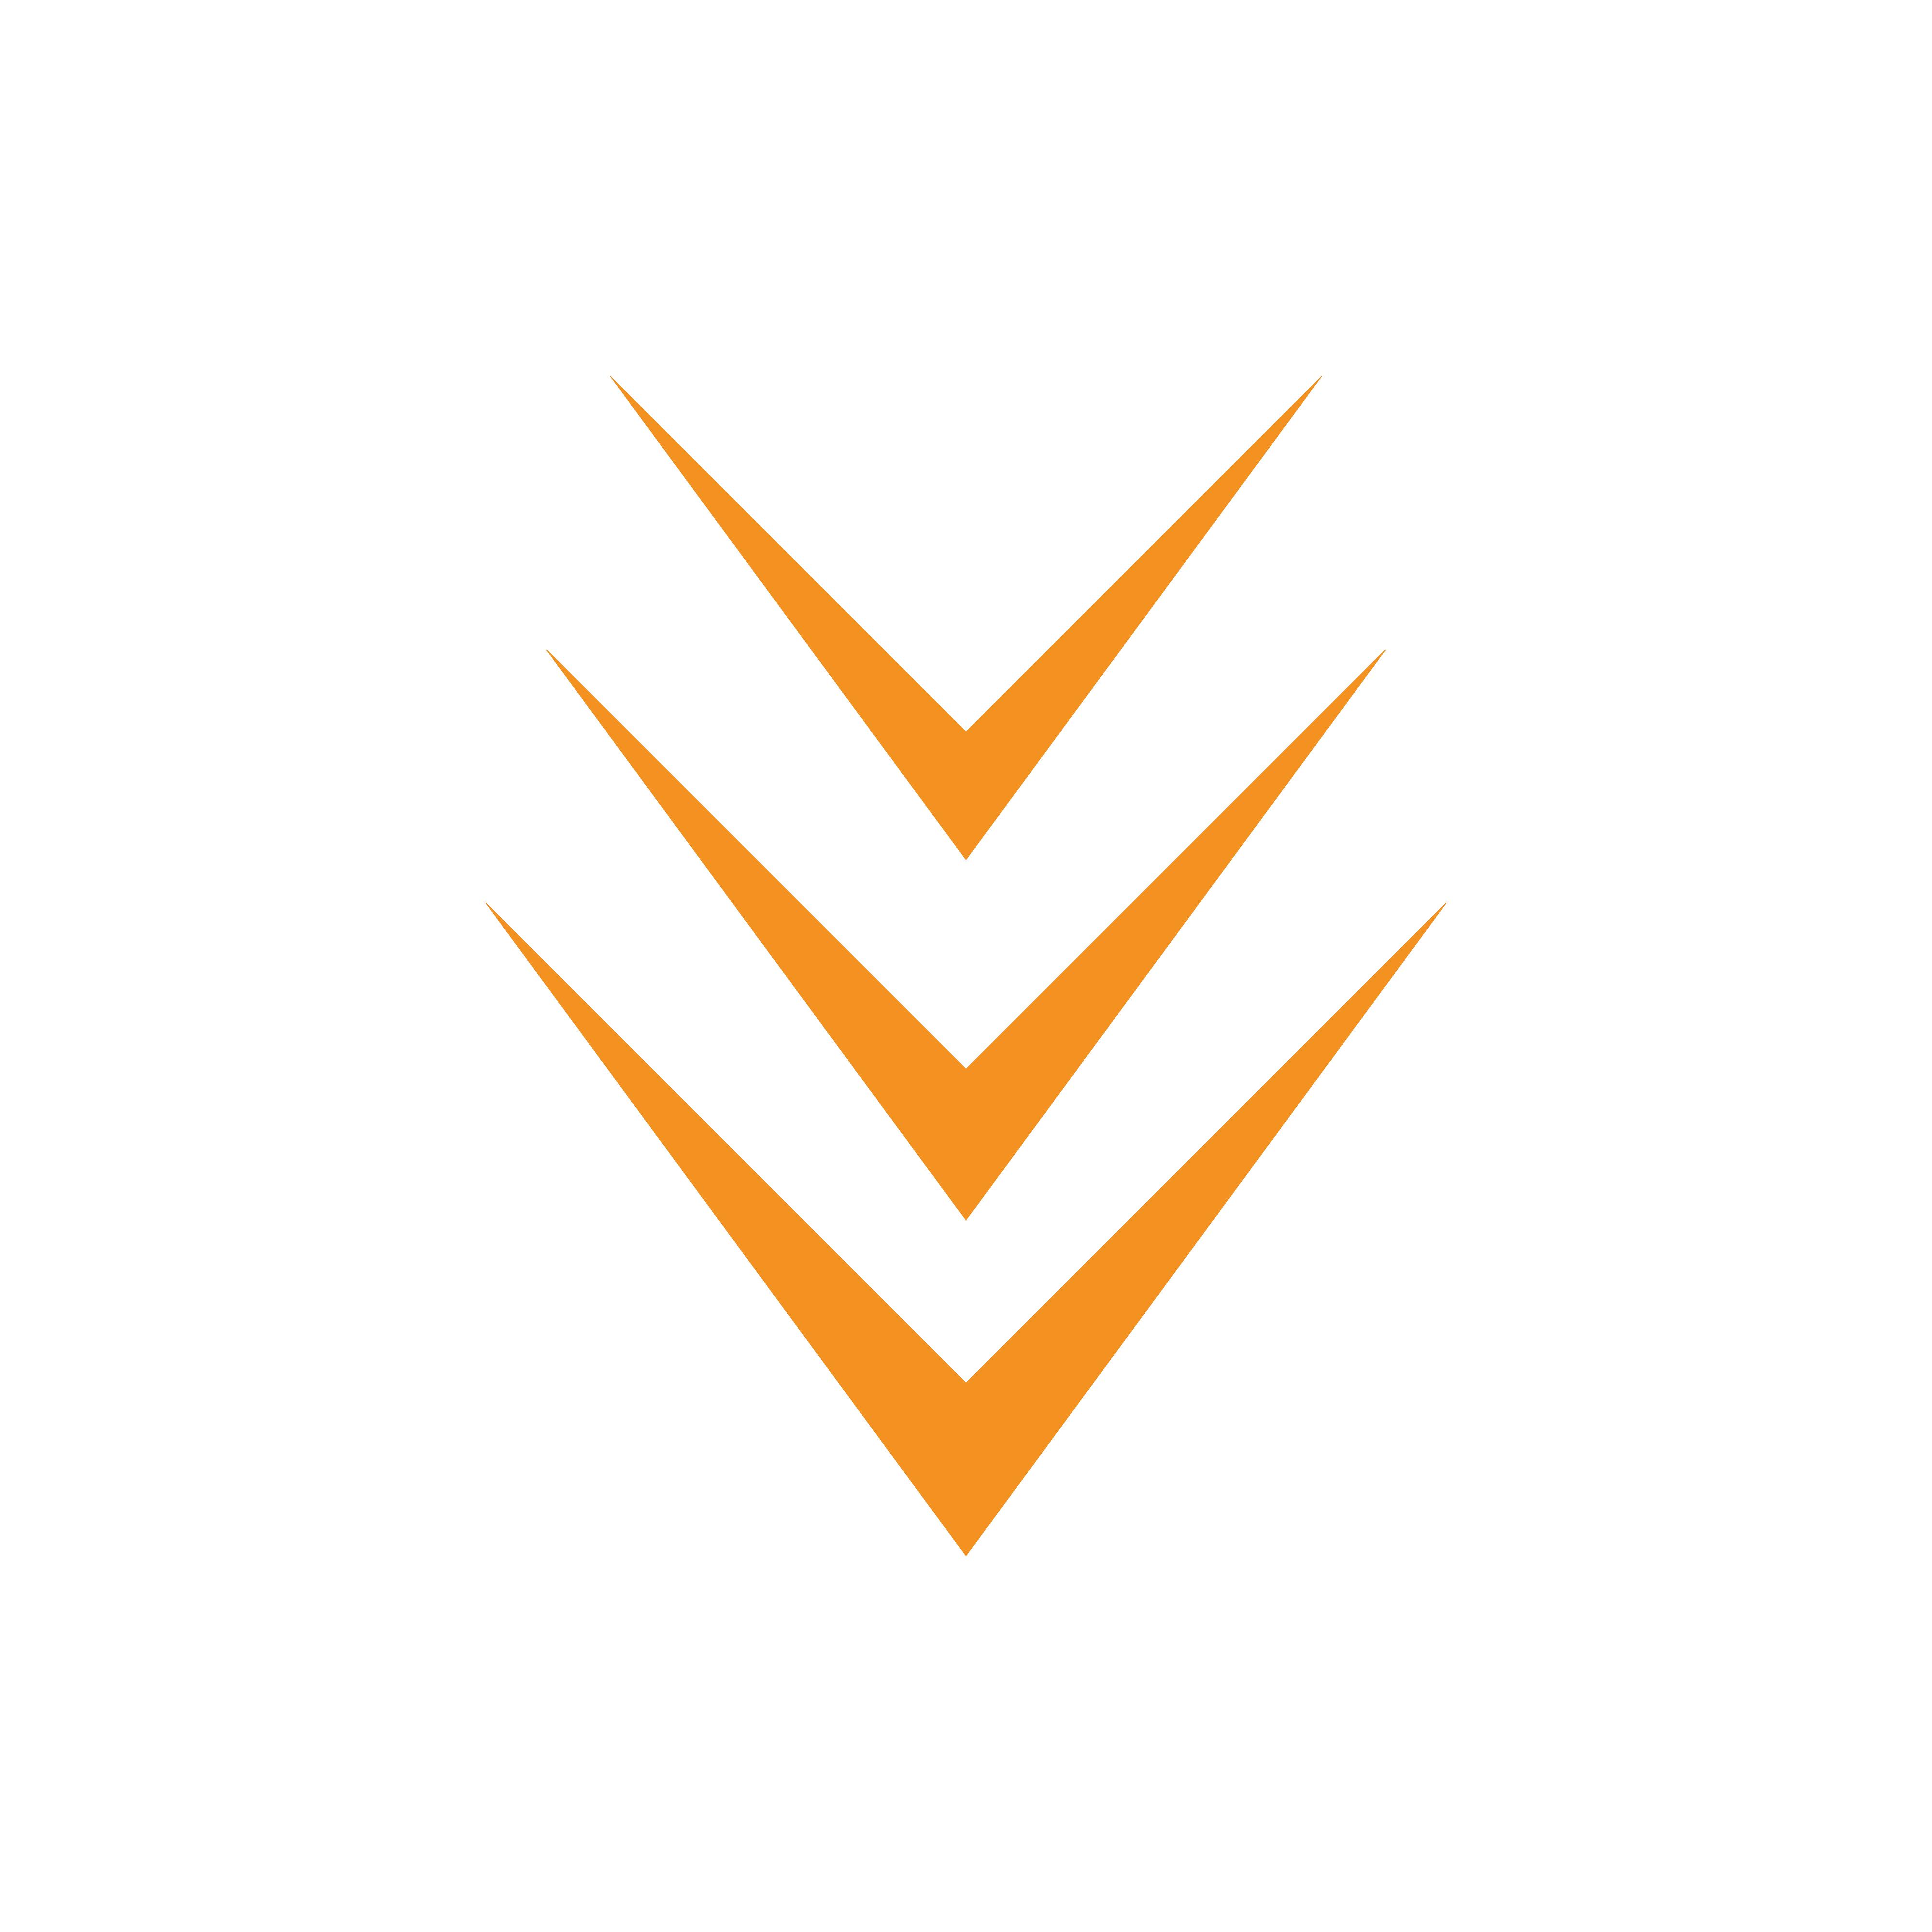 Ребрендинг логотипа сети кофеен фото f_4495e7c7e9f8af34.png